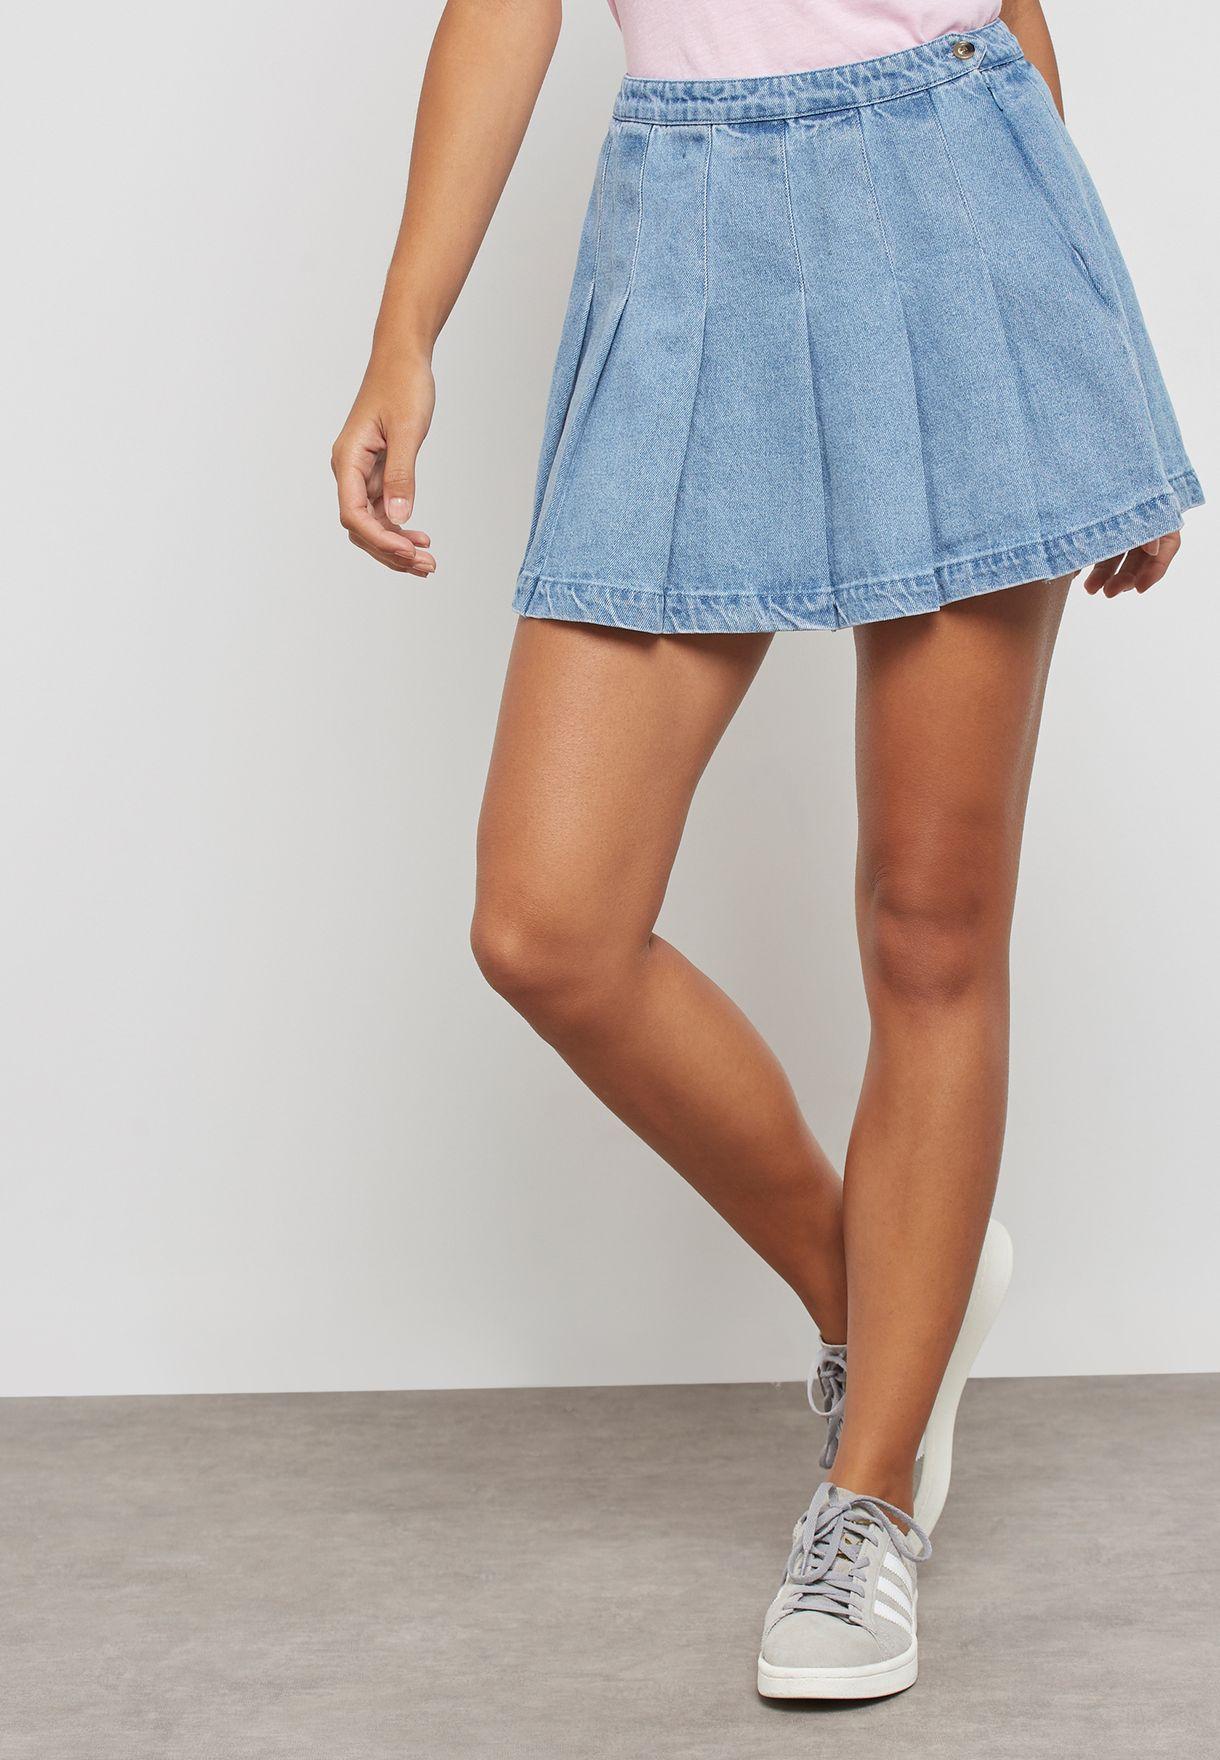 354c591a43 Shop Forever 21 blue Pleated Denim Skirt 253105 for Women in Qatar ...